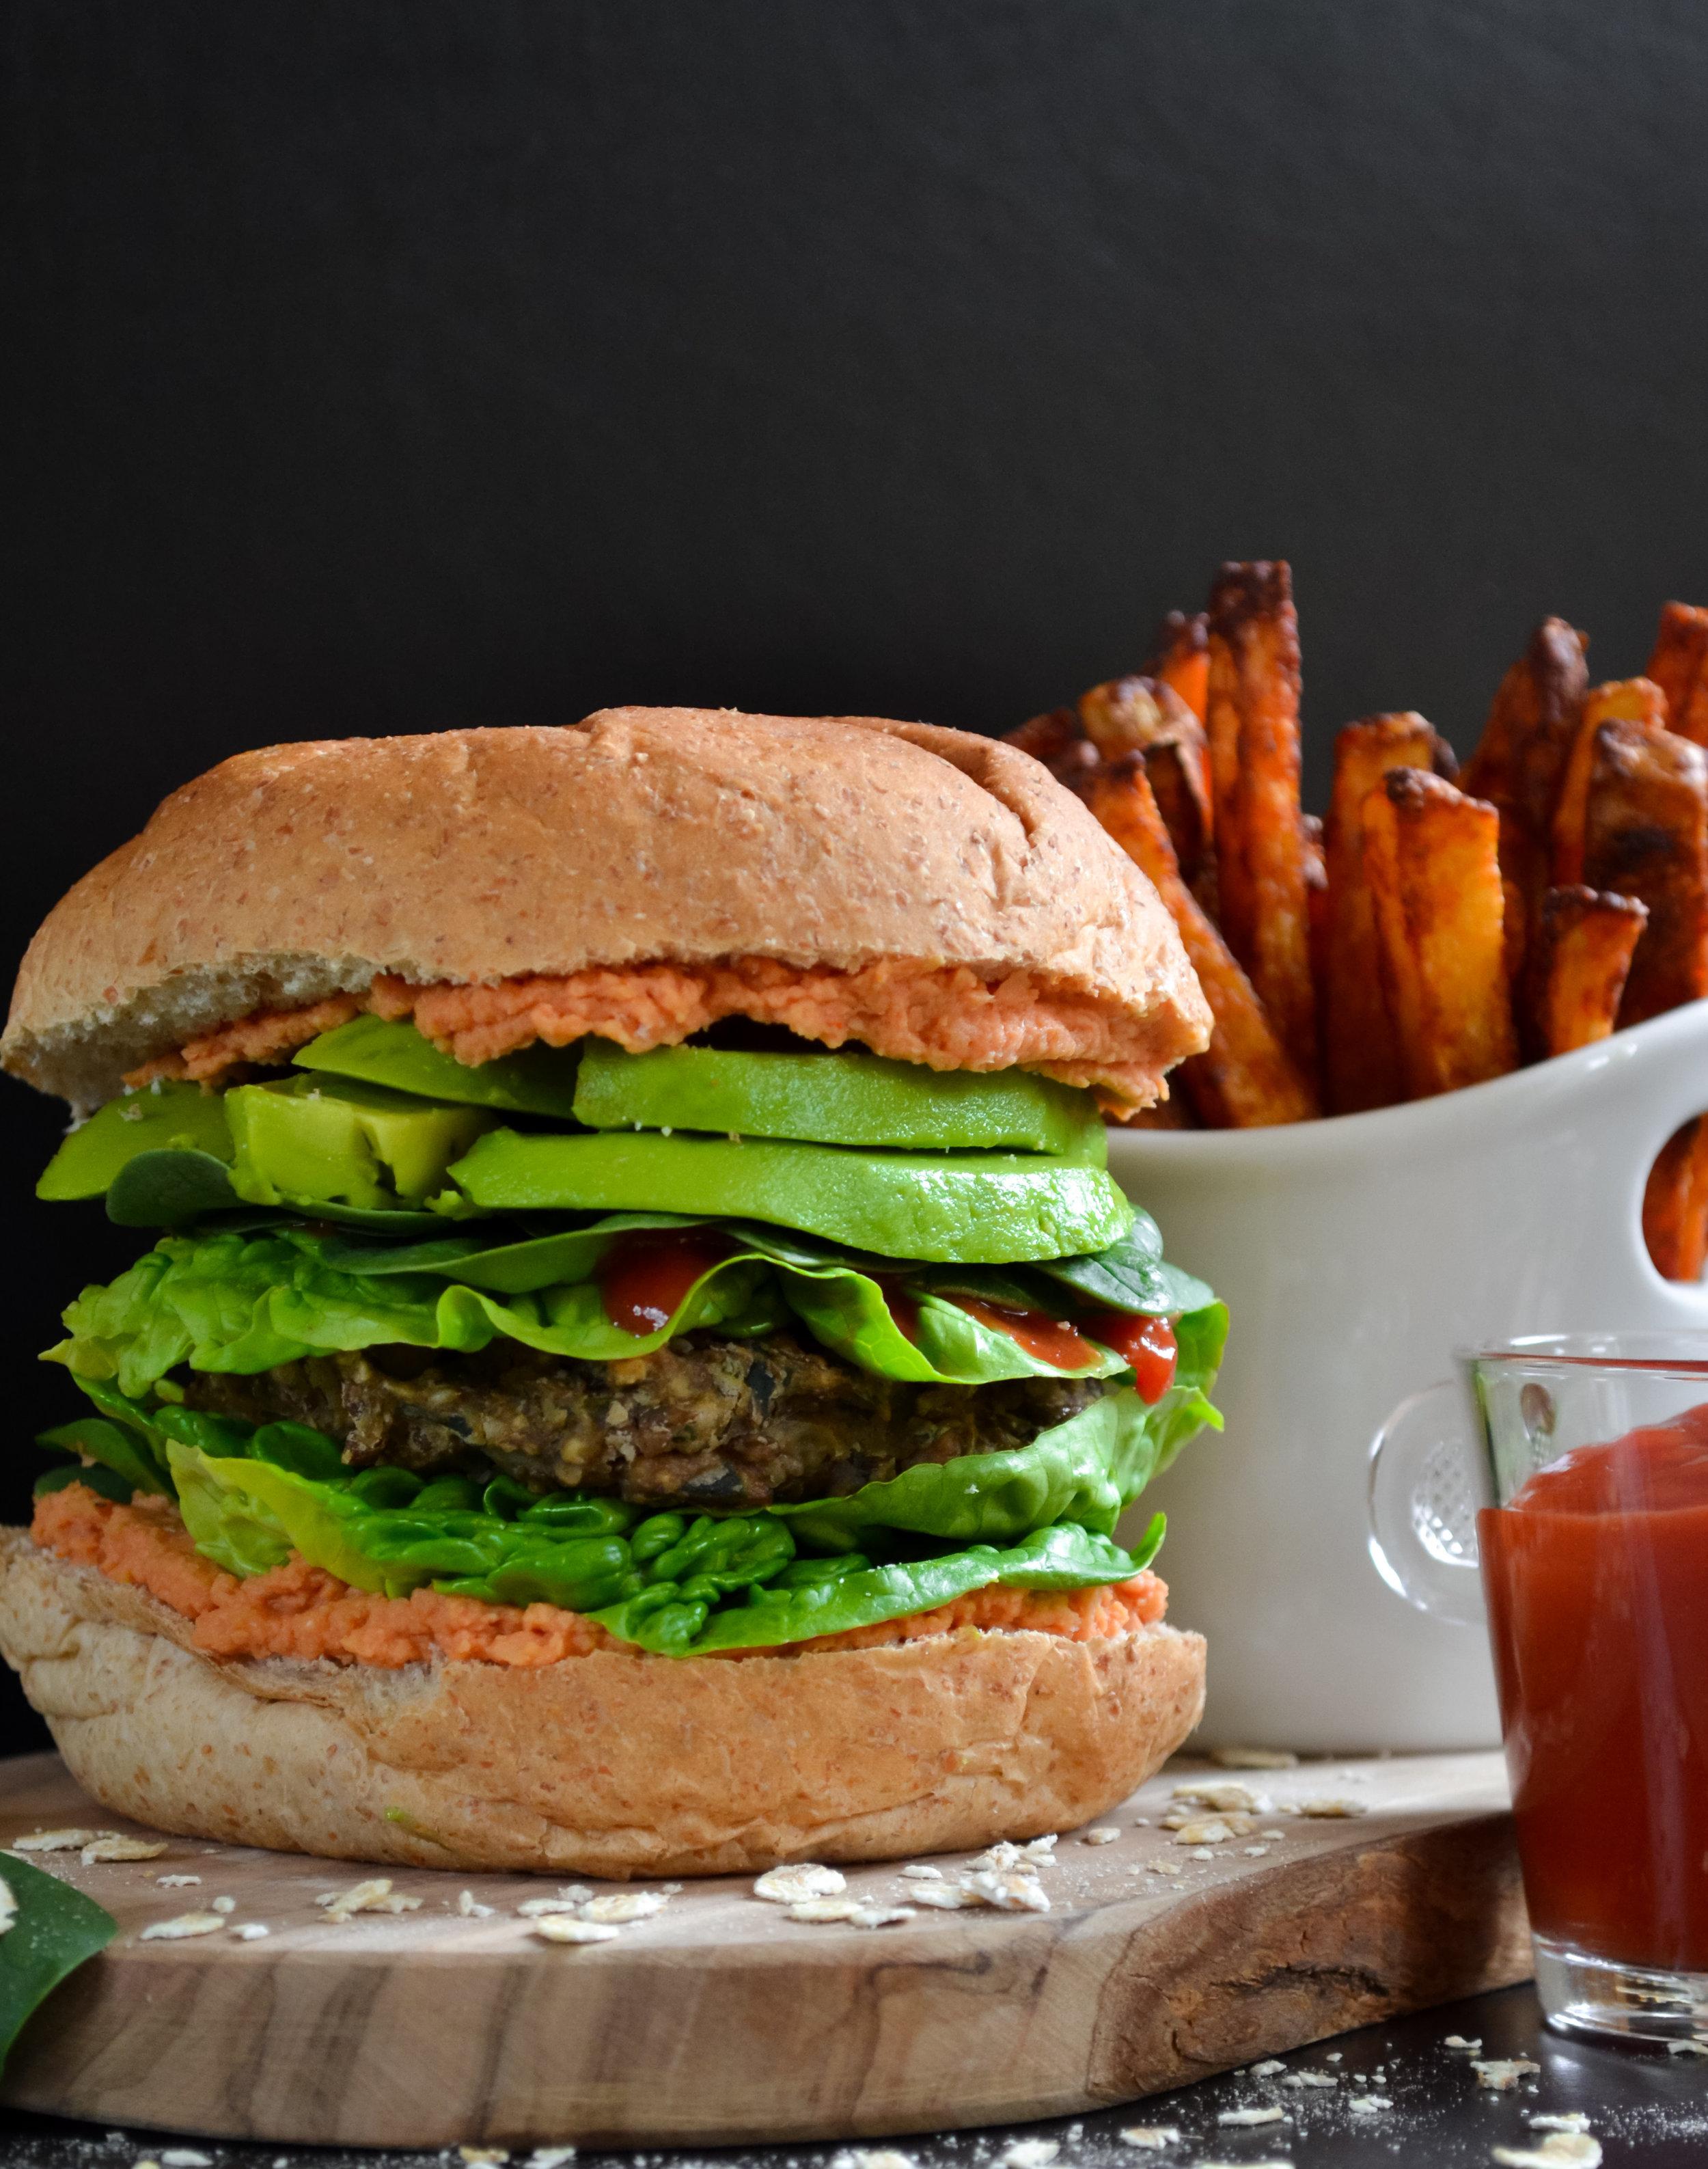 Mushroom, Lentil and Spinach Vegan Burger